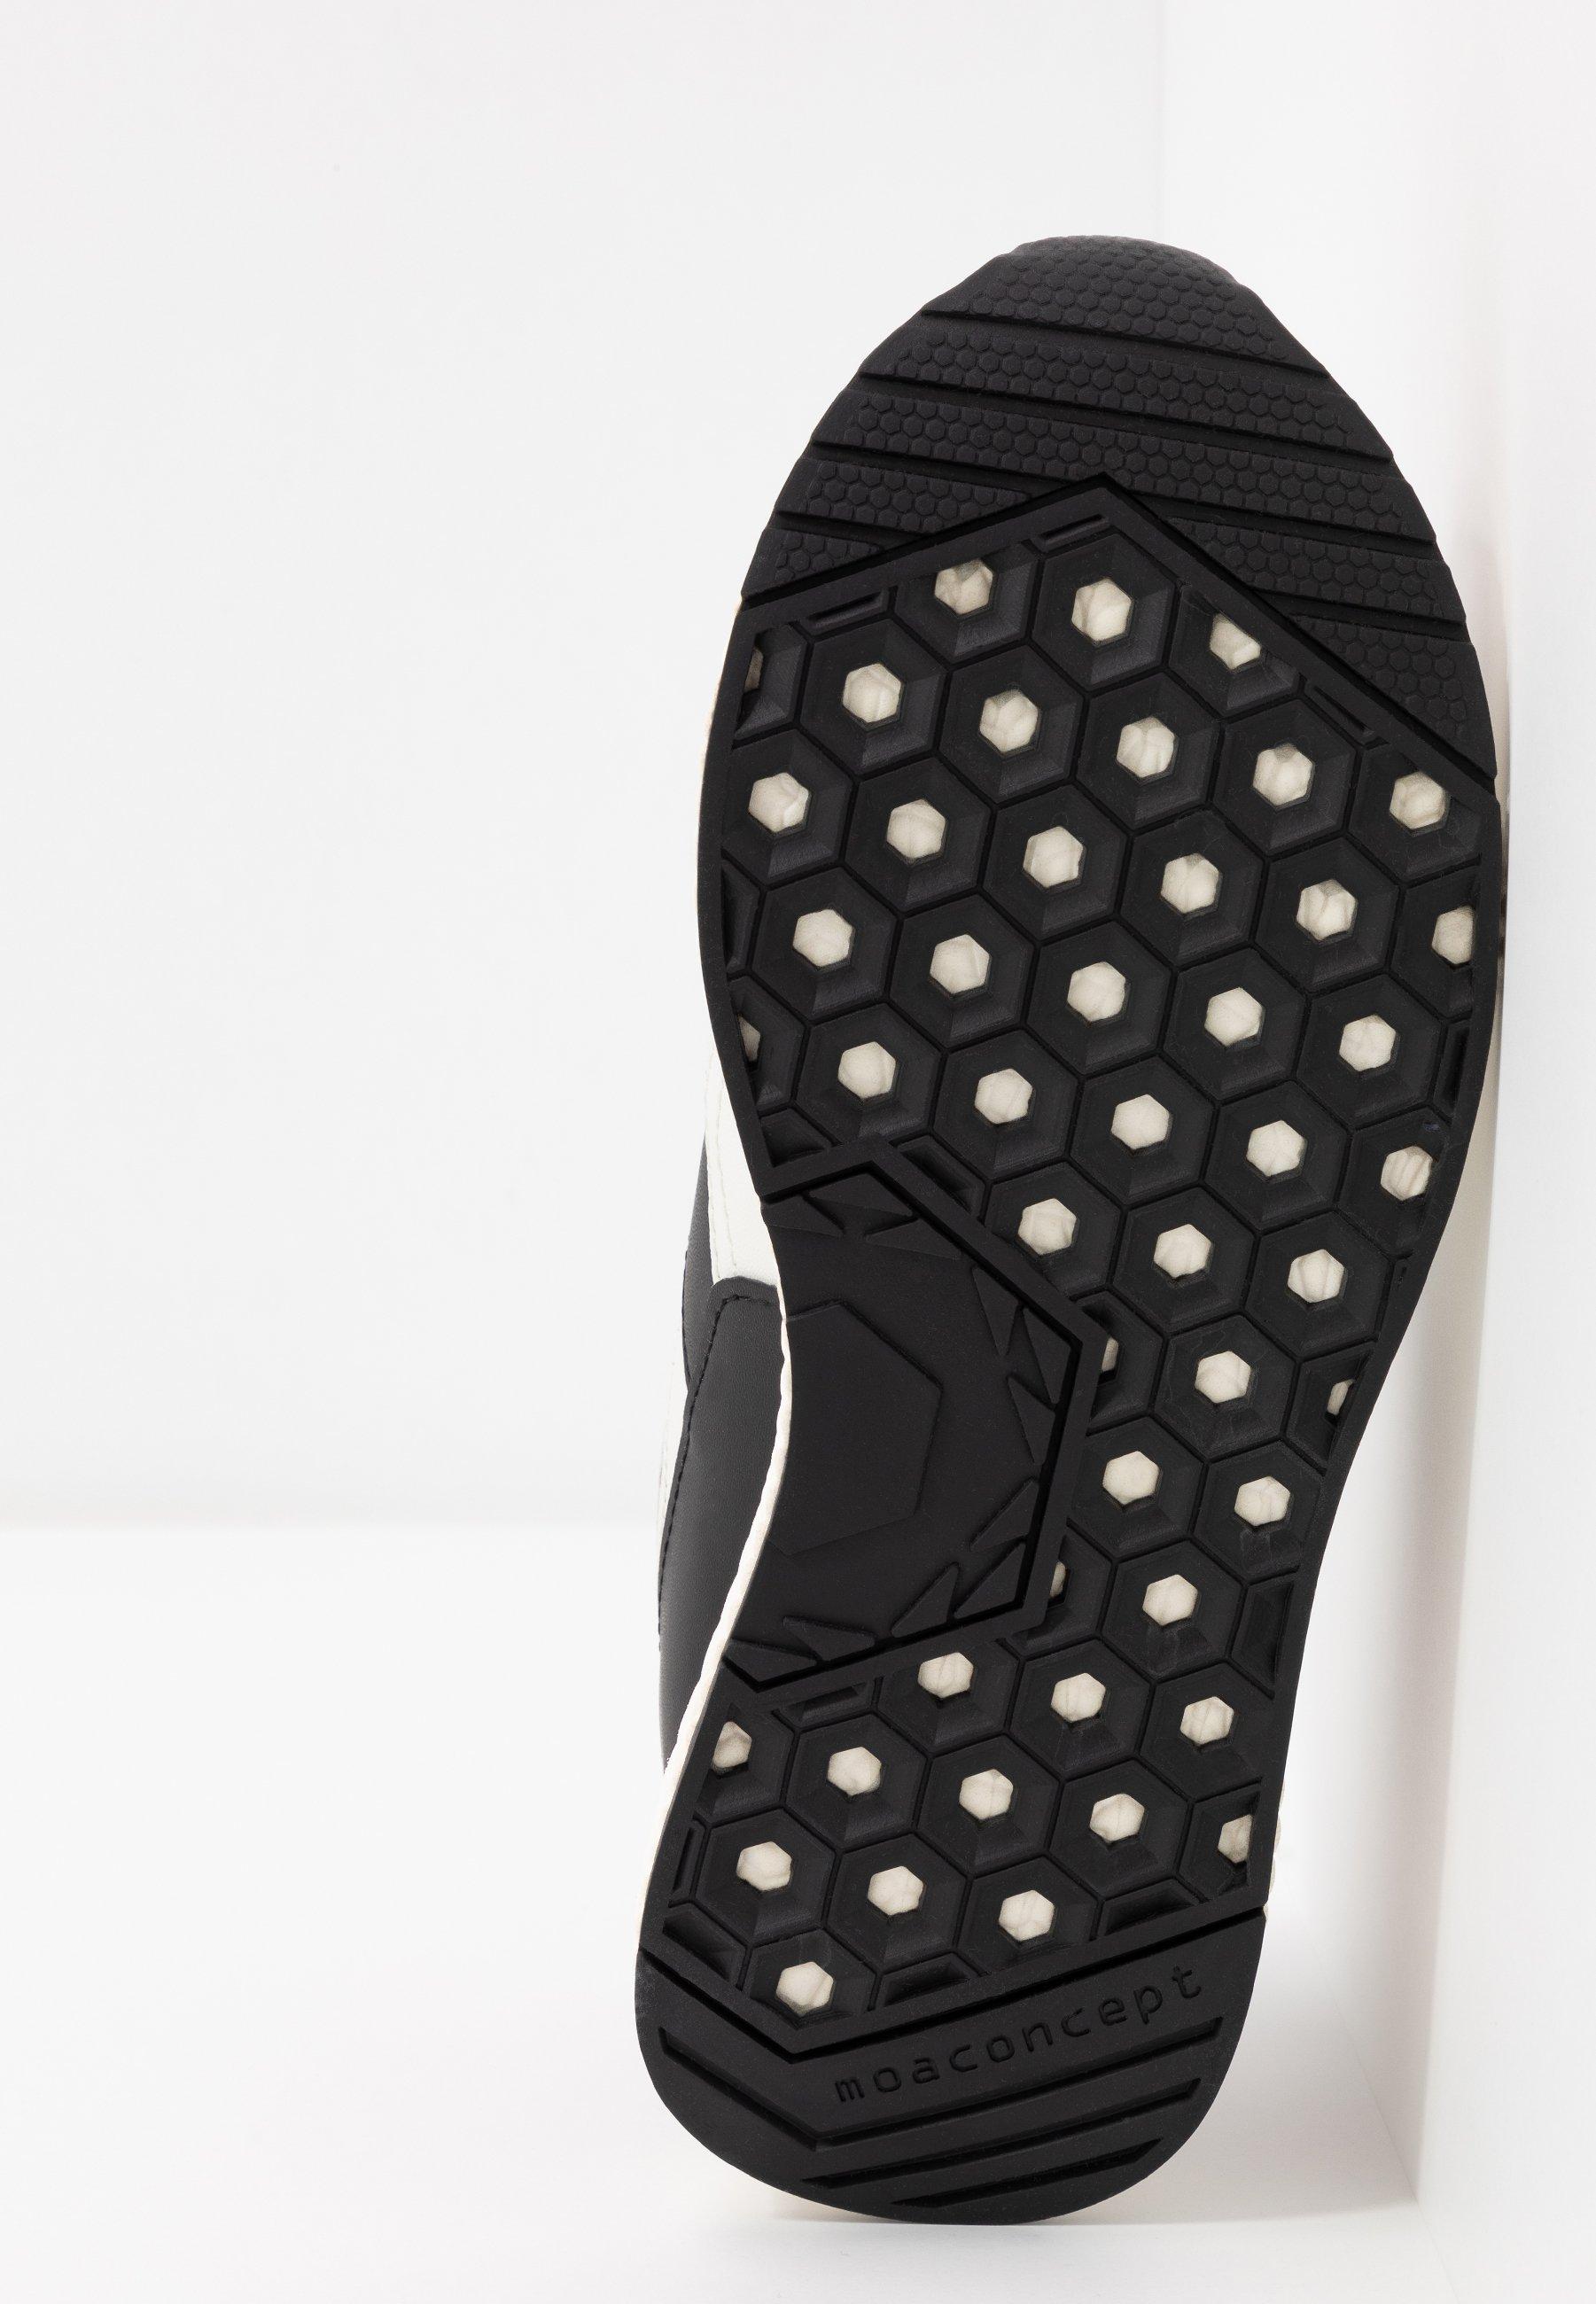 MOA - Master of Arts Sneakers - futura white